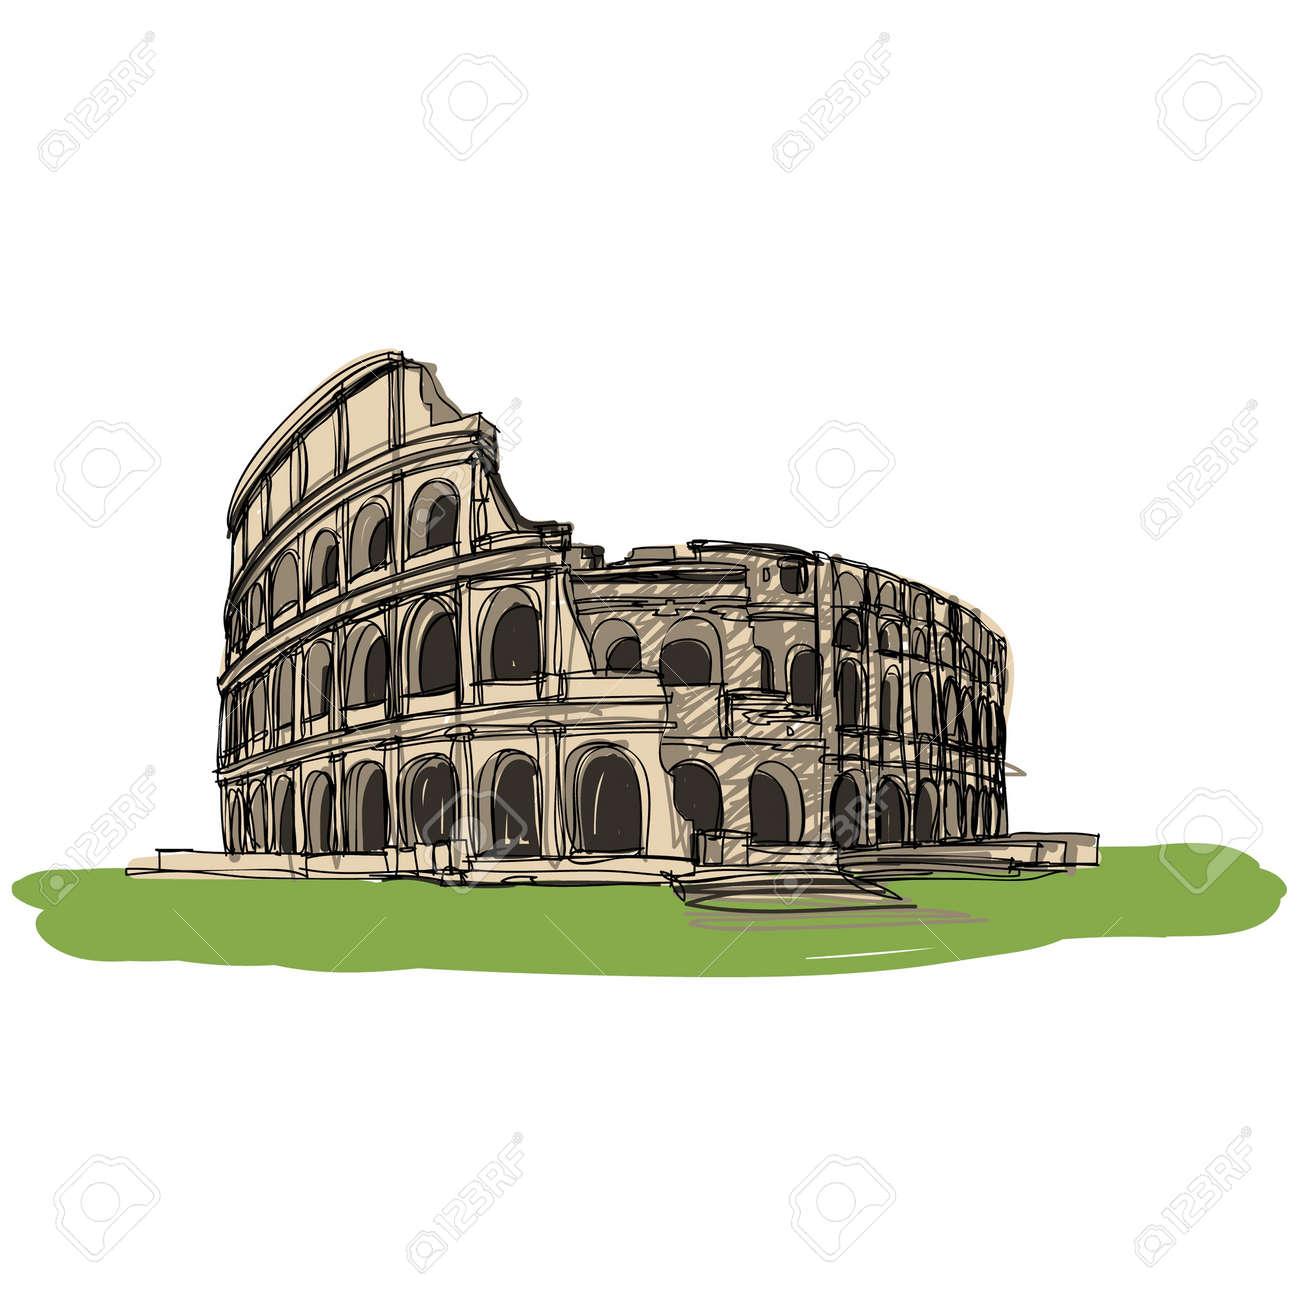 Colosseum Rome Italy sketcbook Stock Vector - 16686433